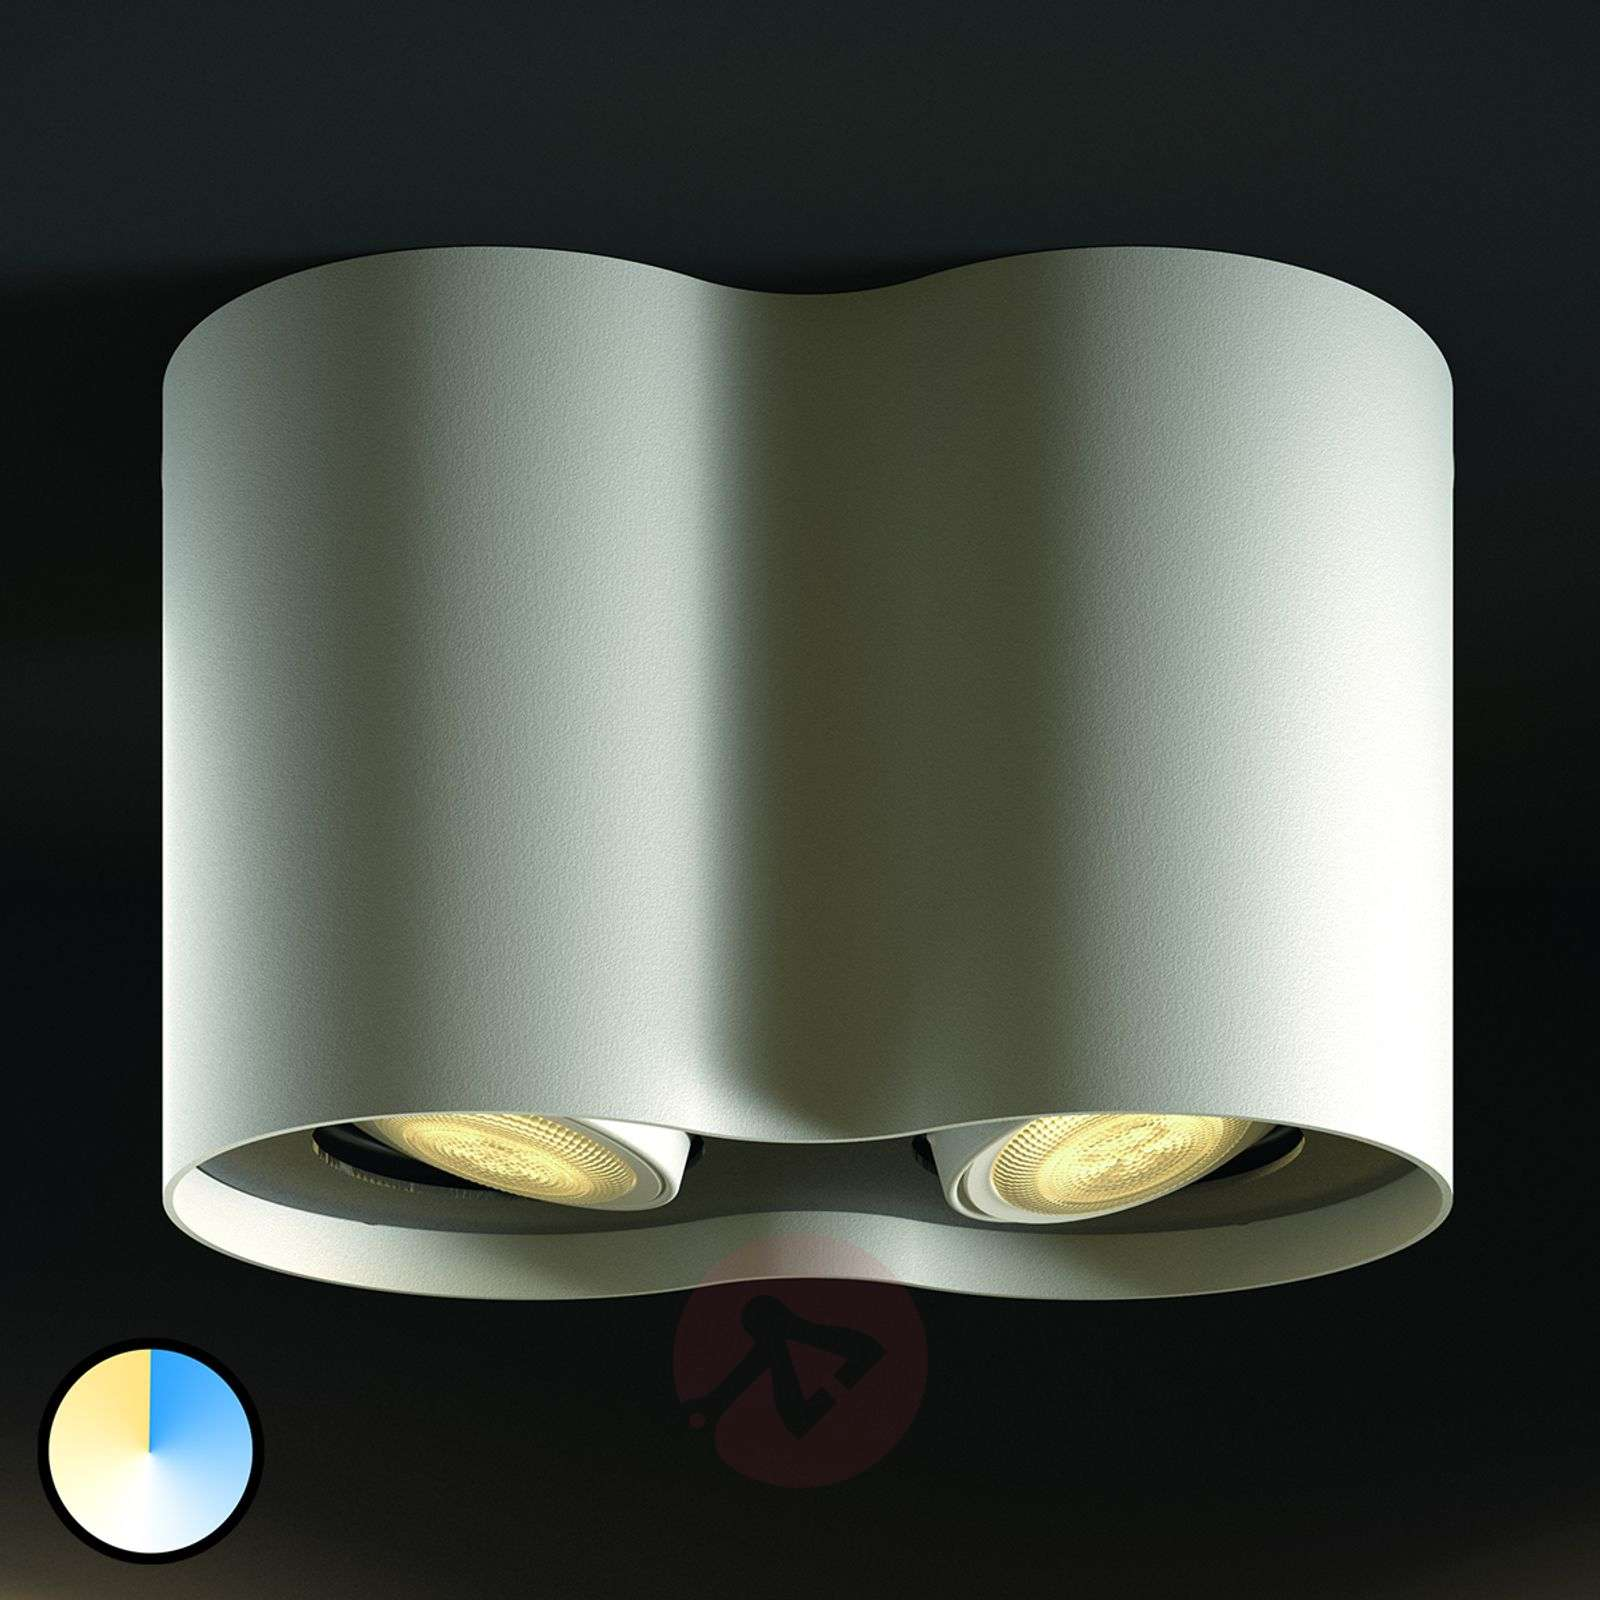 Philips Hue White Ambiance Pillar 2-lampp. valk.-7531883-01